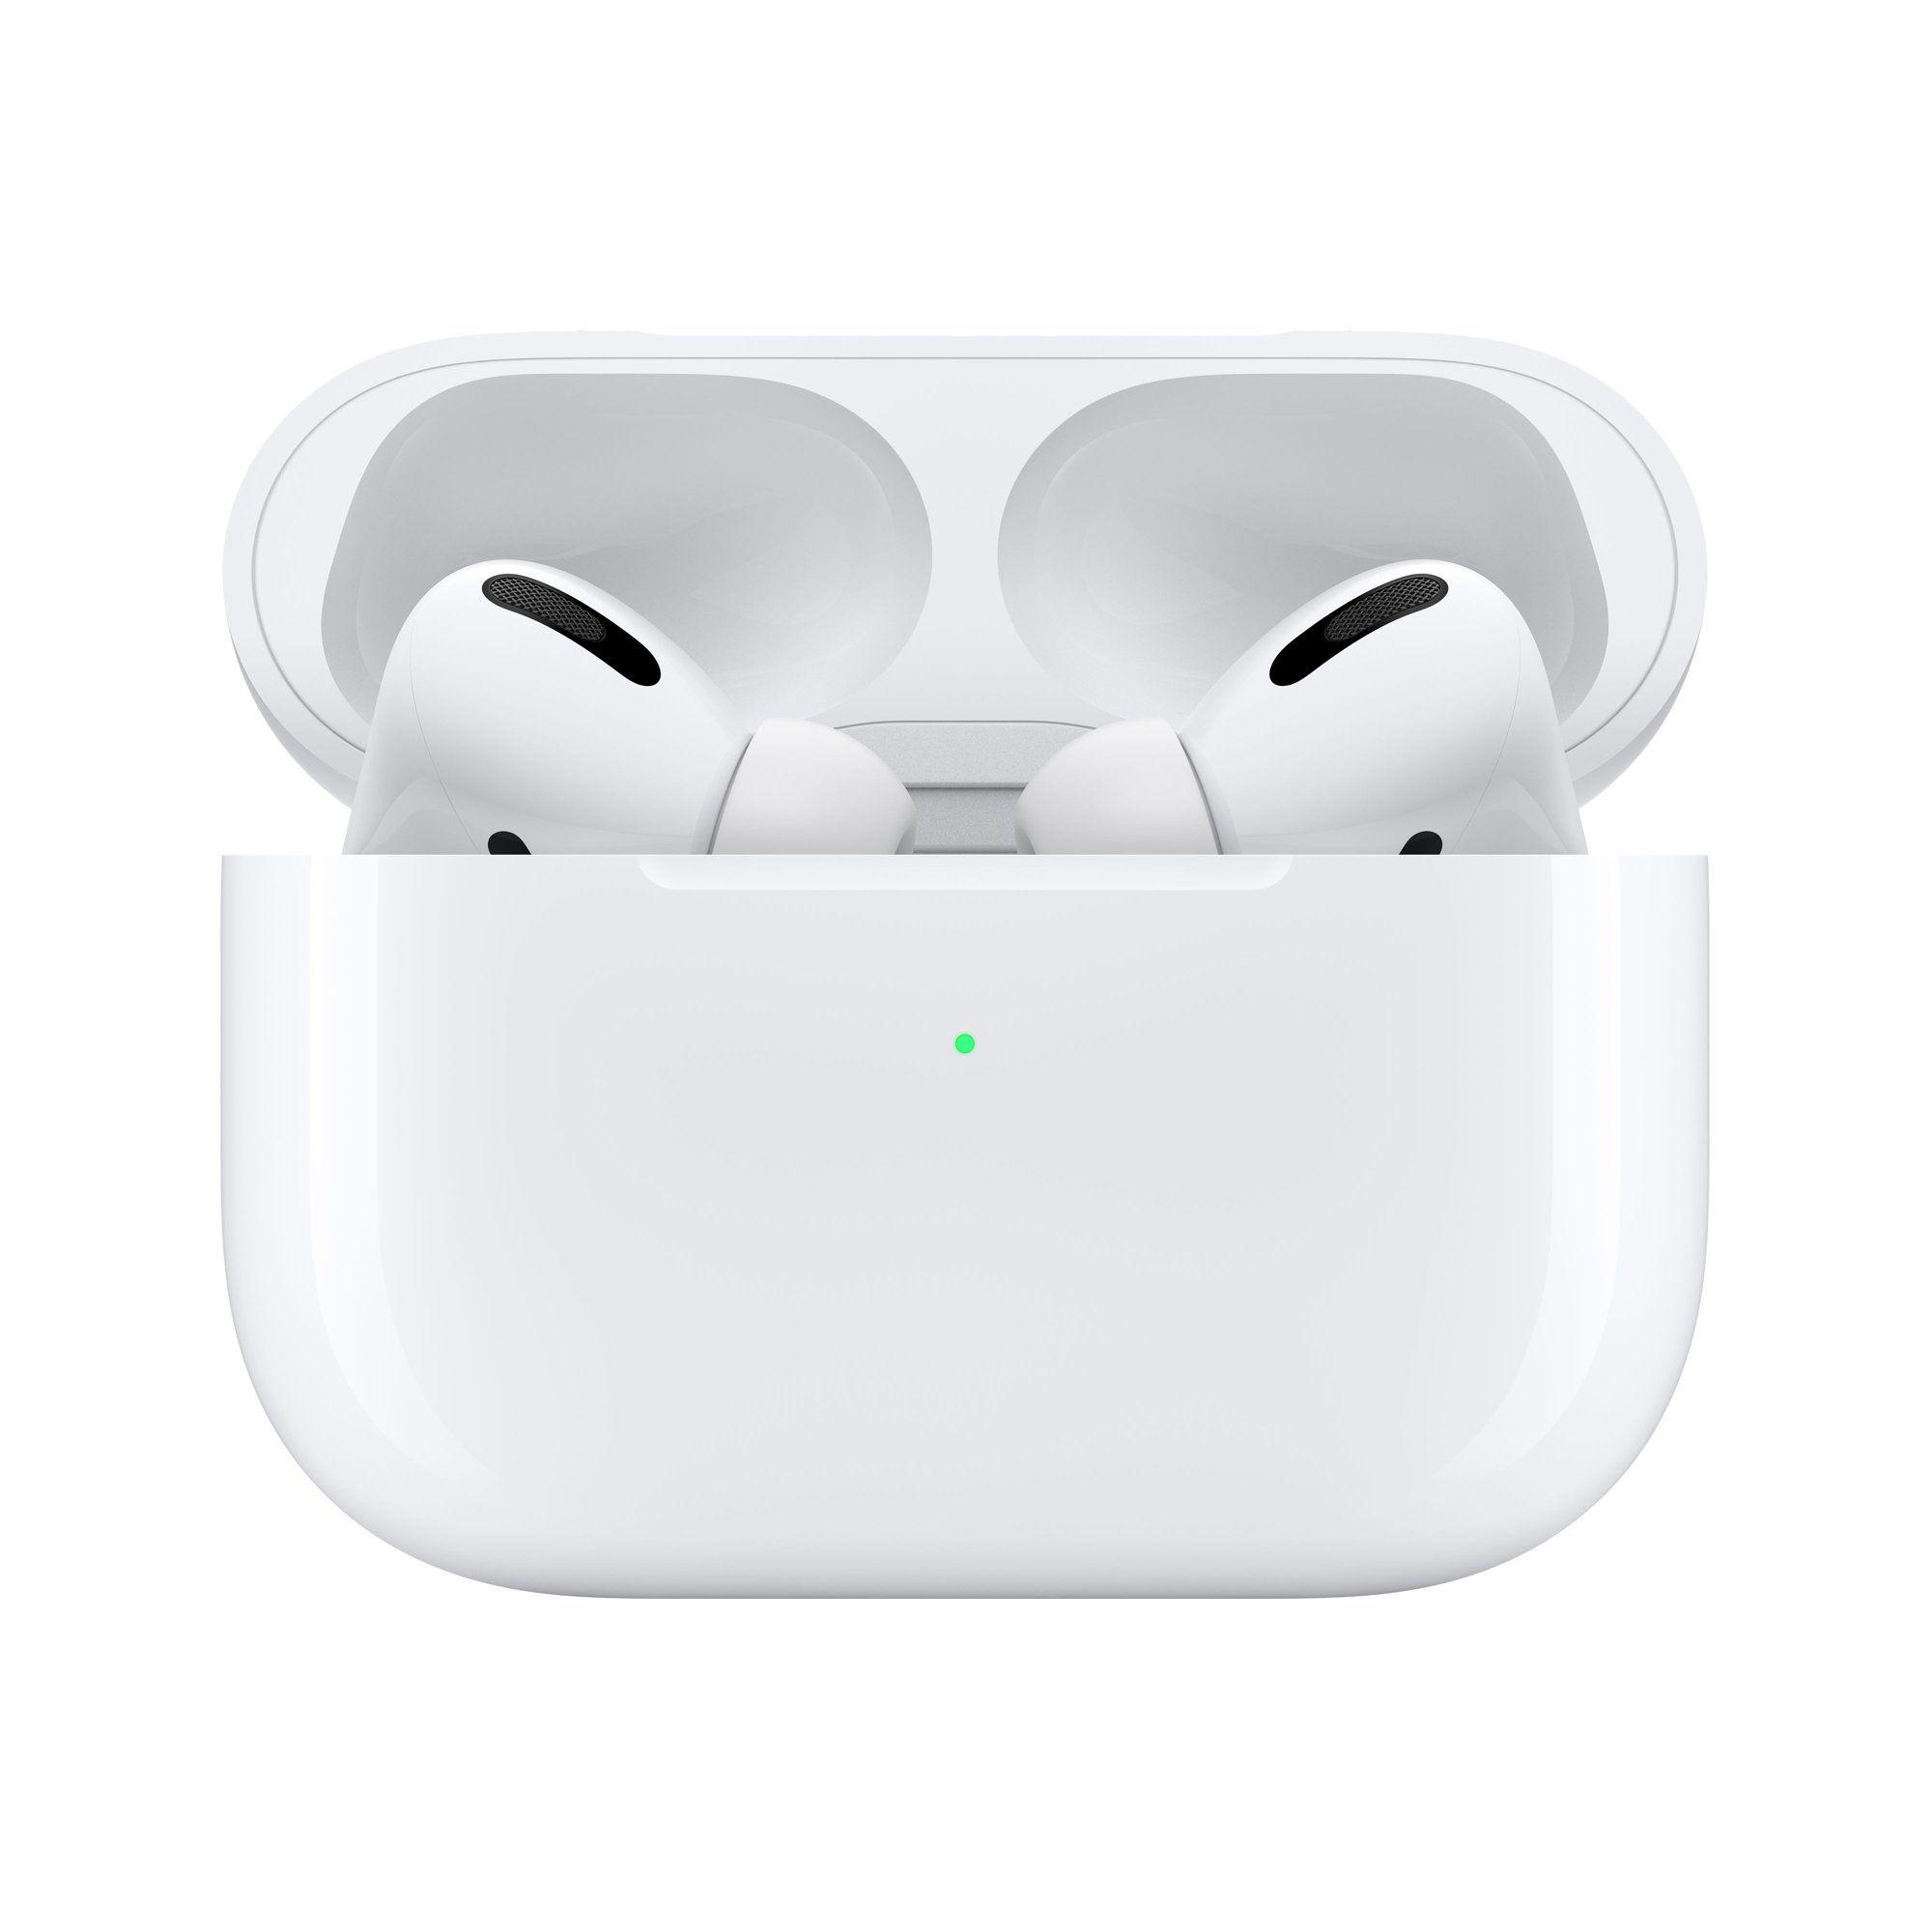 Apple Airpods Pro Walmart Com Airpods Pro Headphones Bluetooth Earbuds